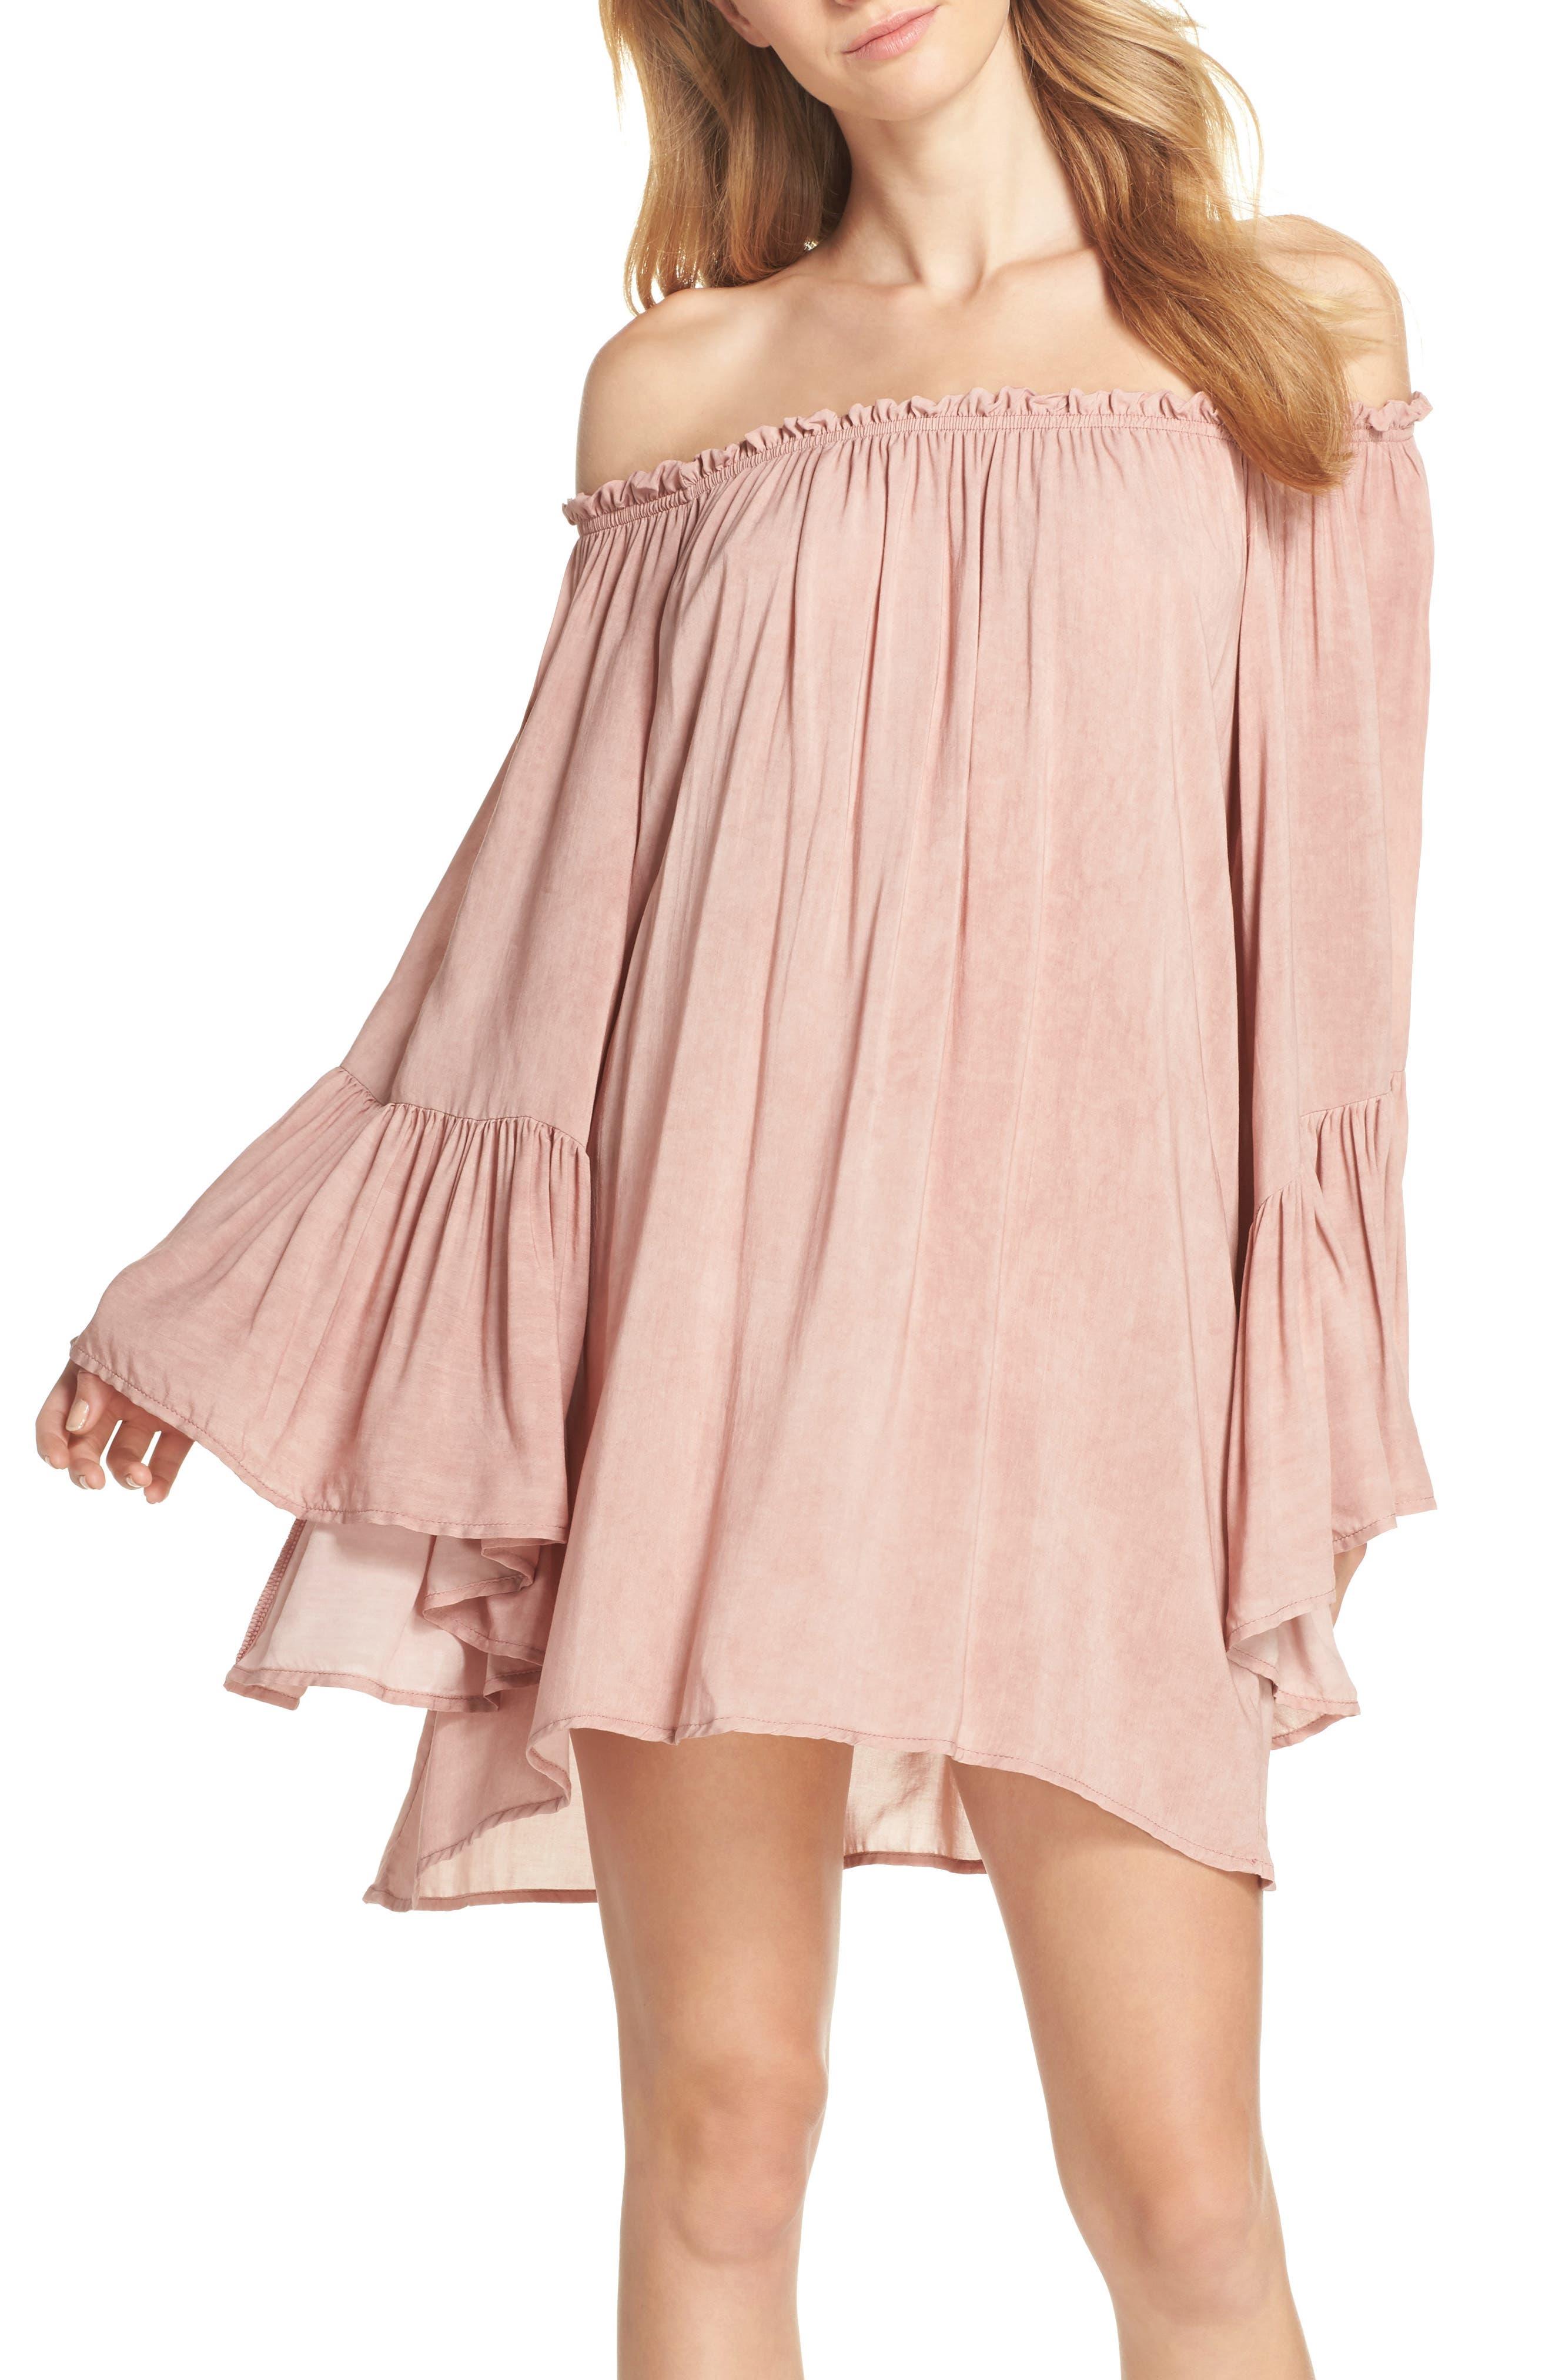 Main Image - Elan Bell Sleeve Cover-Up Tunic Dress